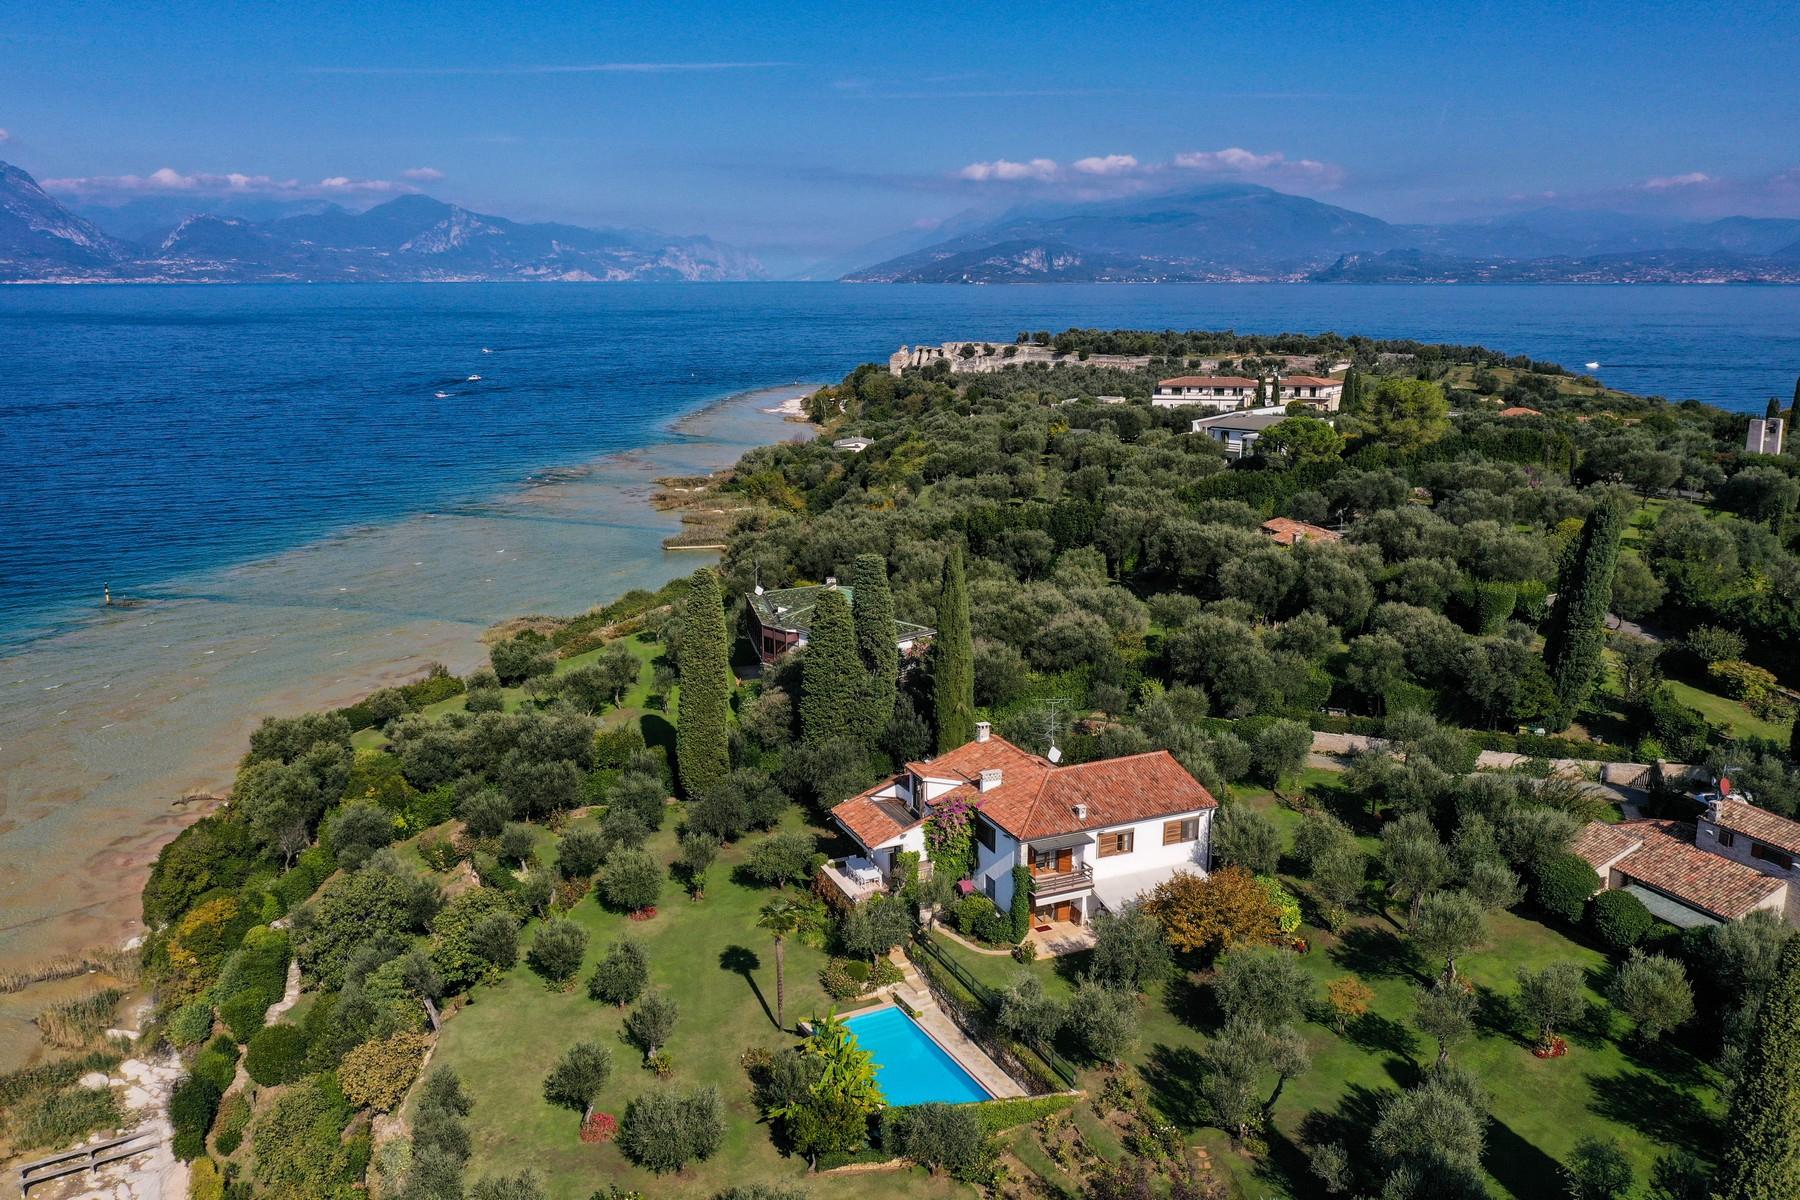 Villa in Vendita a Sirmione: 5 locali, 500 mq - Foto 2